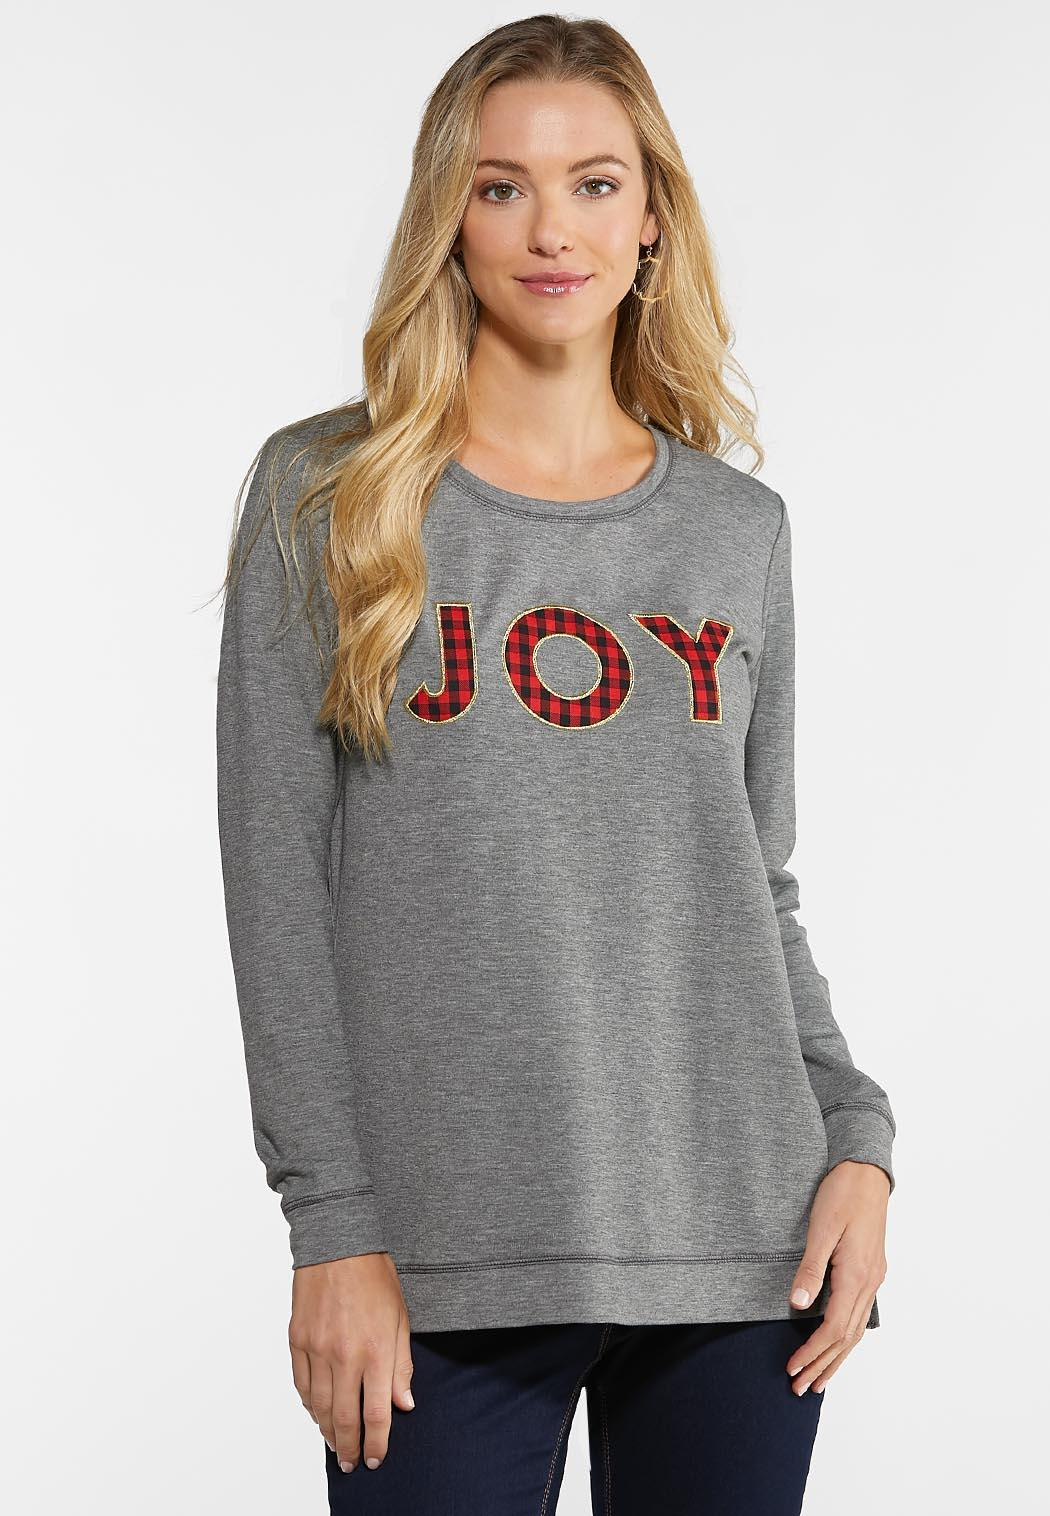 Plus Size Plaid Joy Sweatshirt